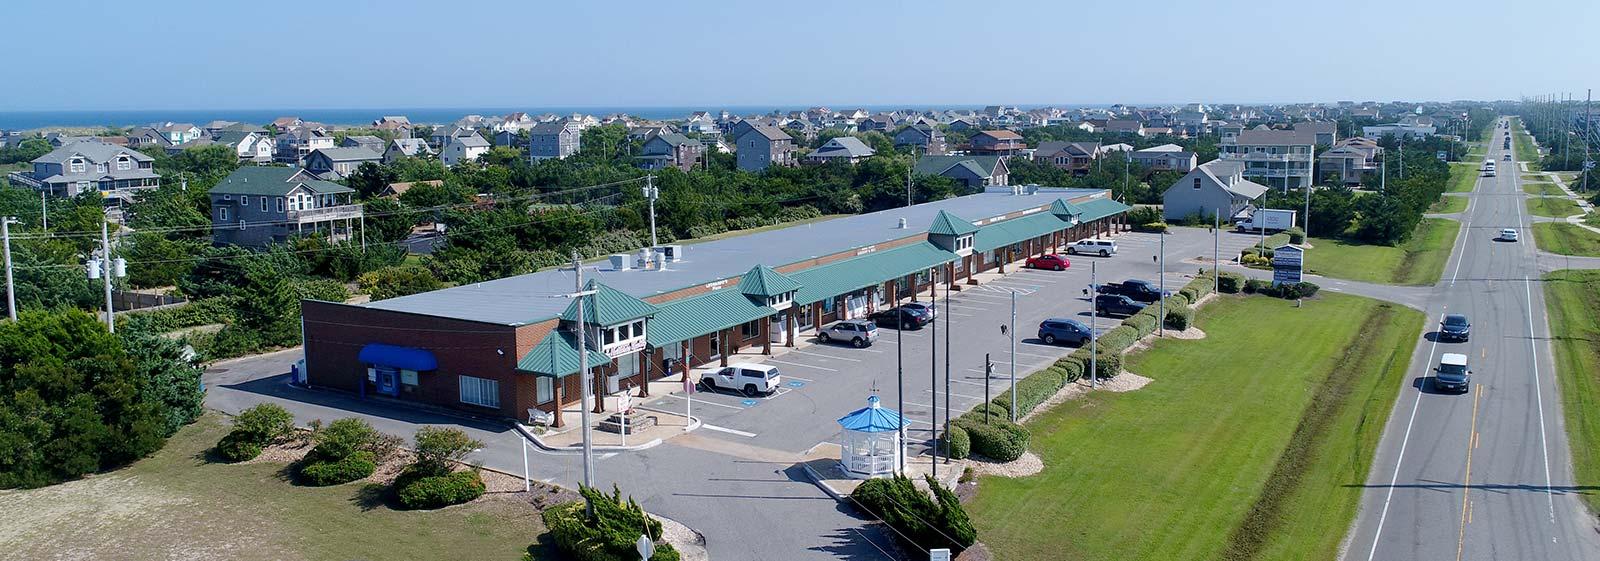 St. Waves Plaza